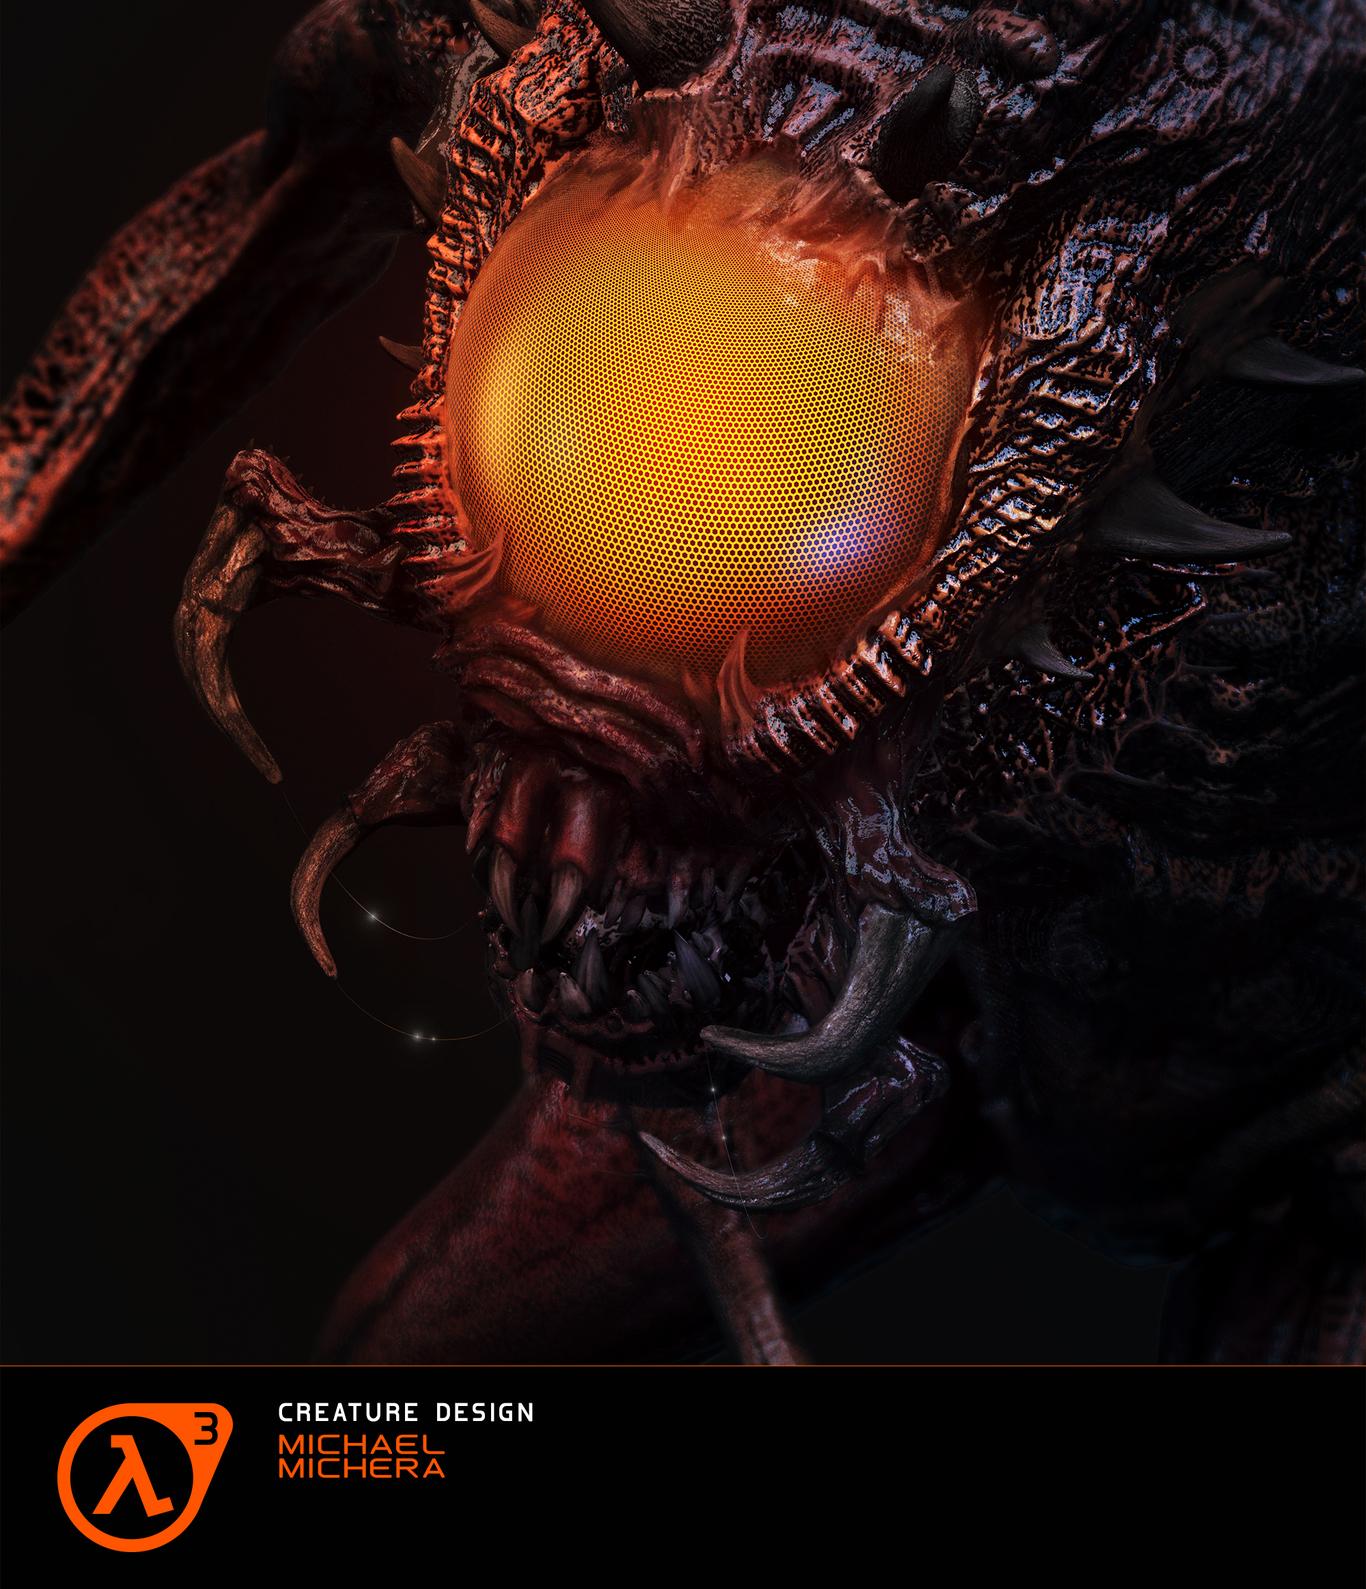 Half Life 3 - Vortigaunts' Beast (eye II)